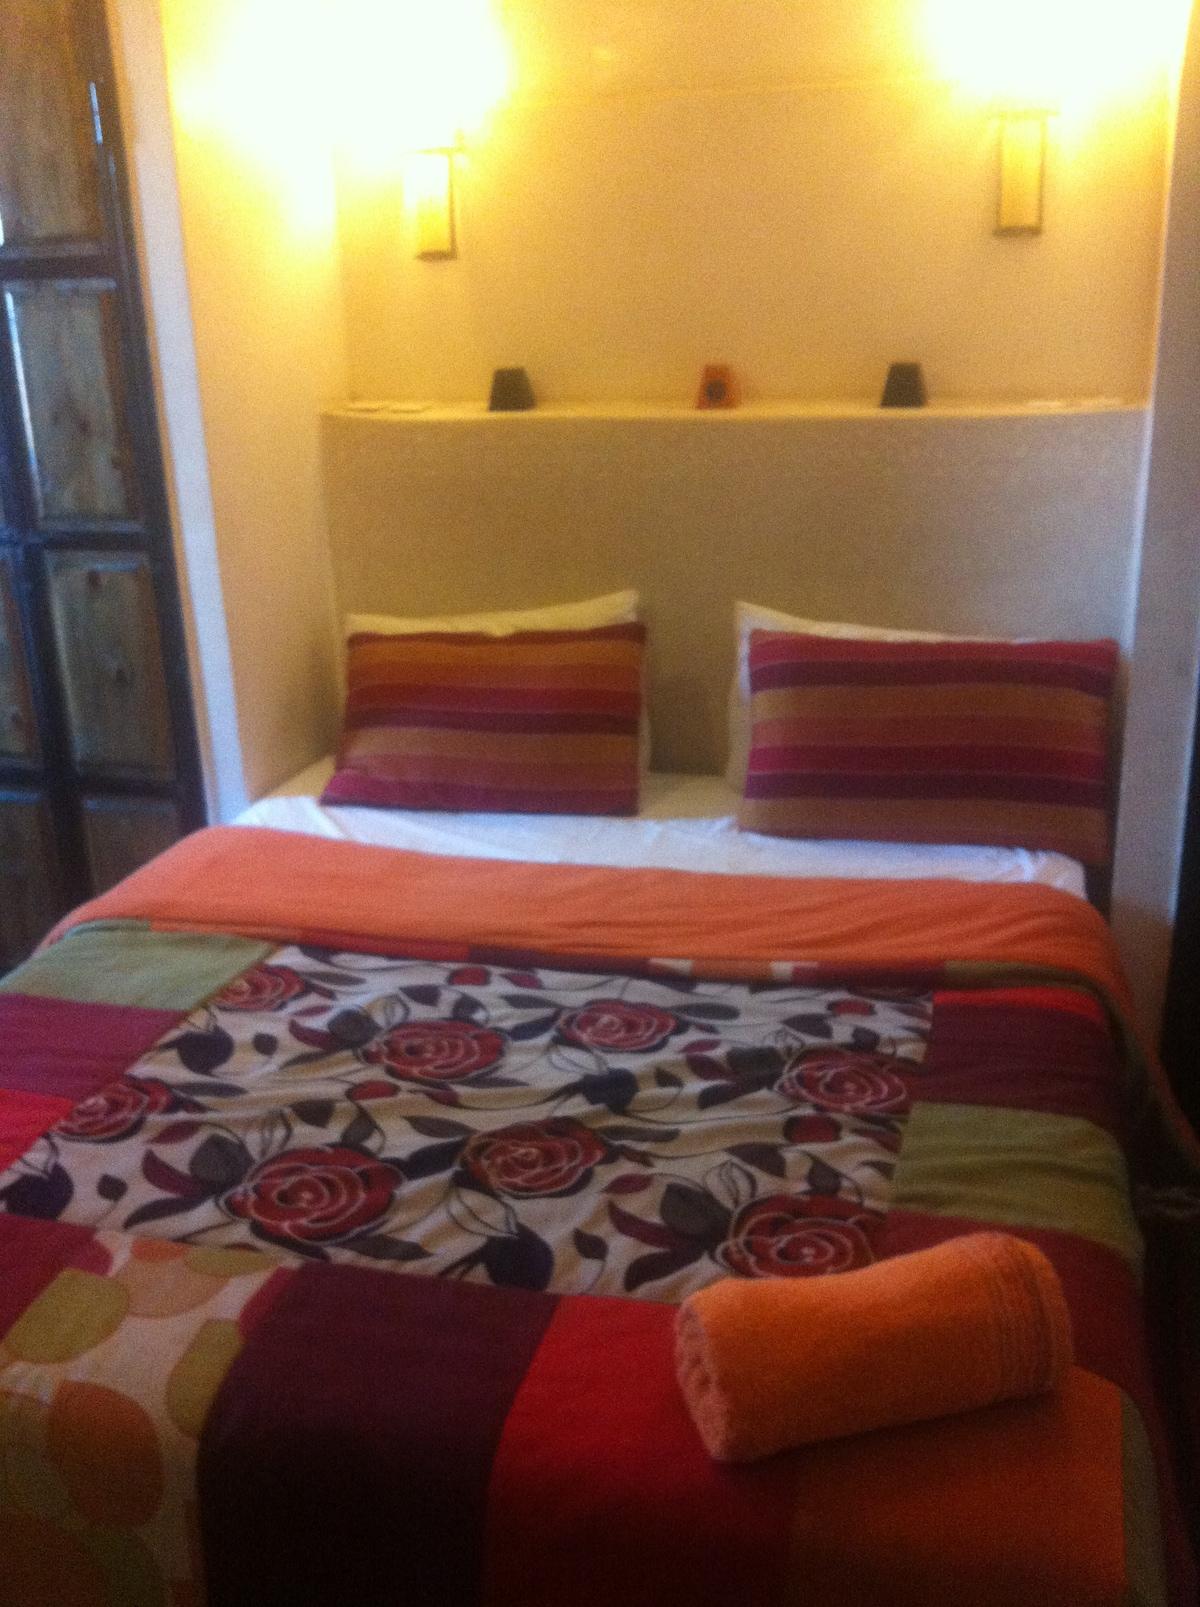 1 bedroom,bath,wifi,kitchen,shower